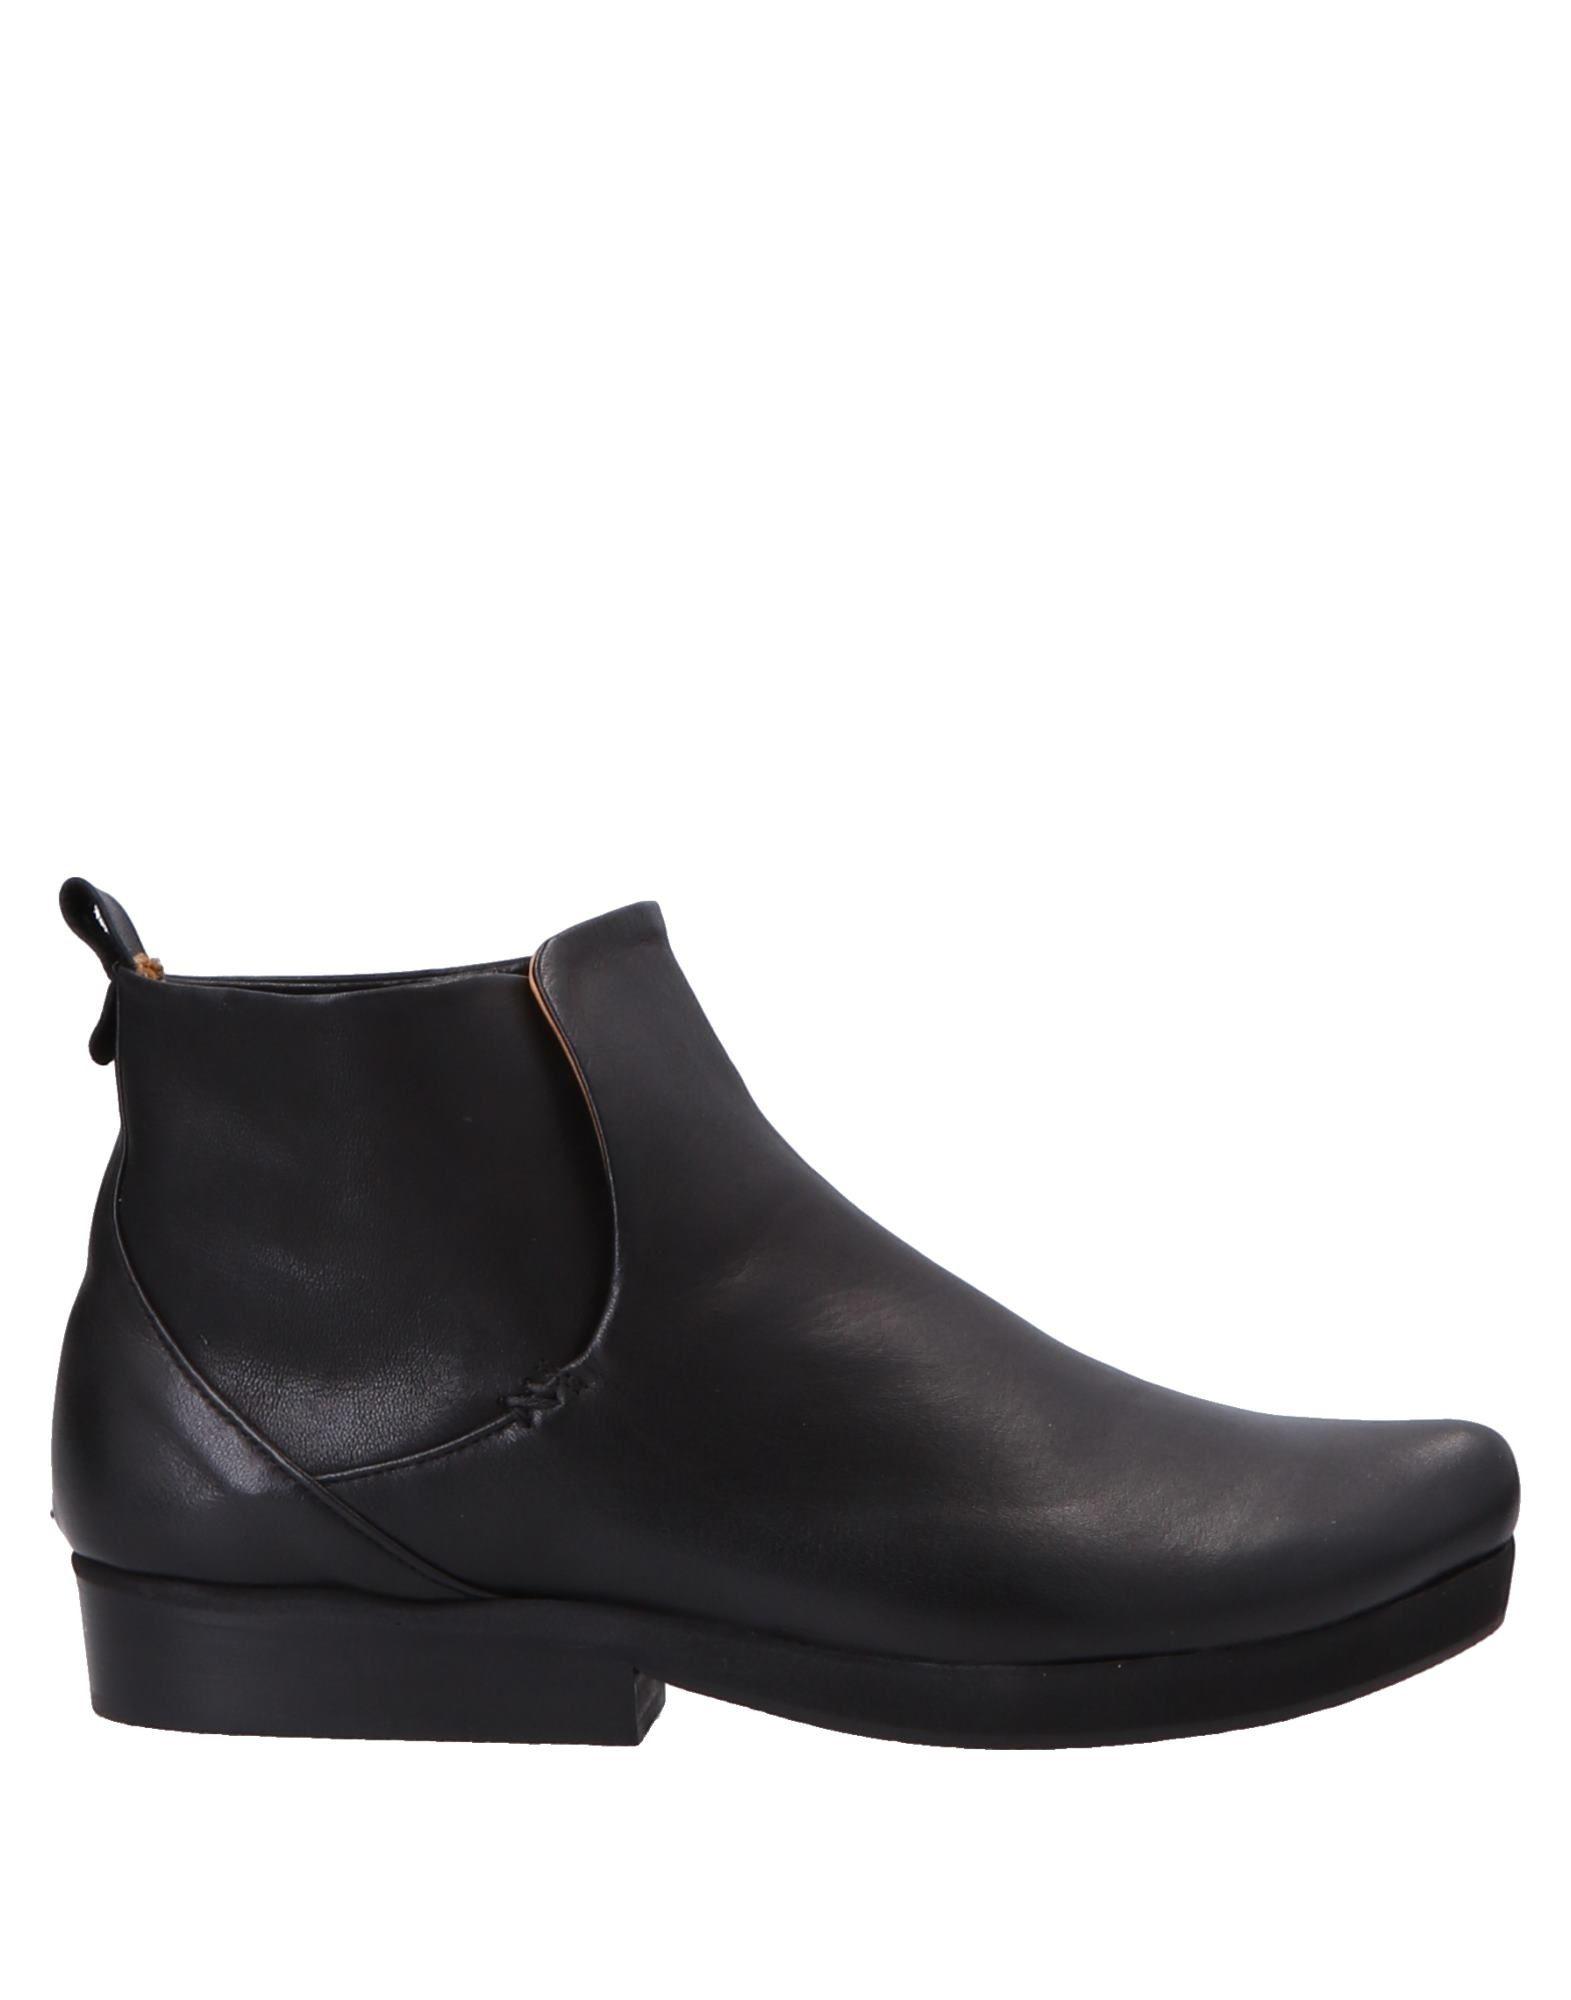 Gut um billige Schuhe Damen zu tragenTracey Neuls Stiefelette Damen Schuhe  11545798RA b7d3cf